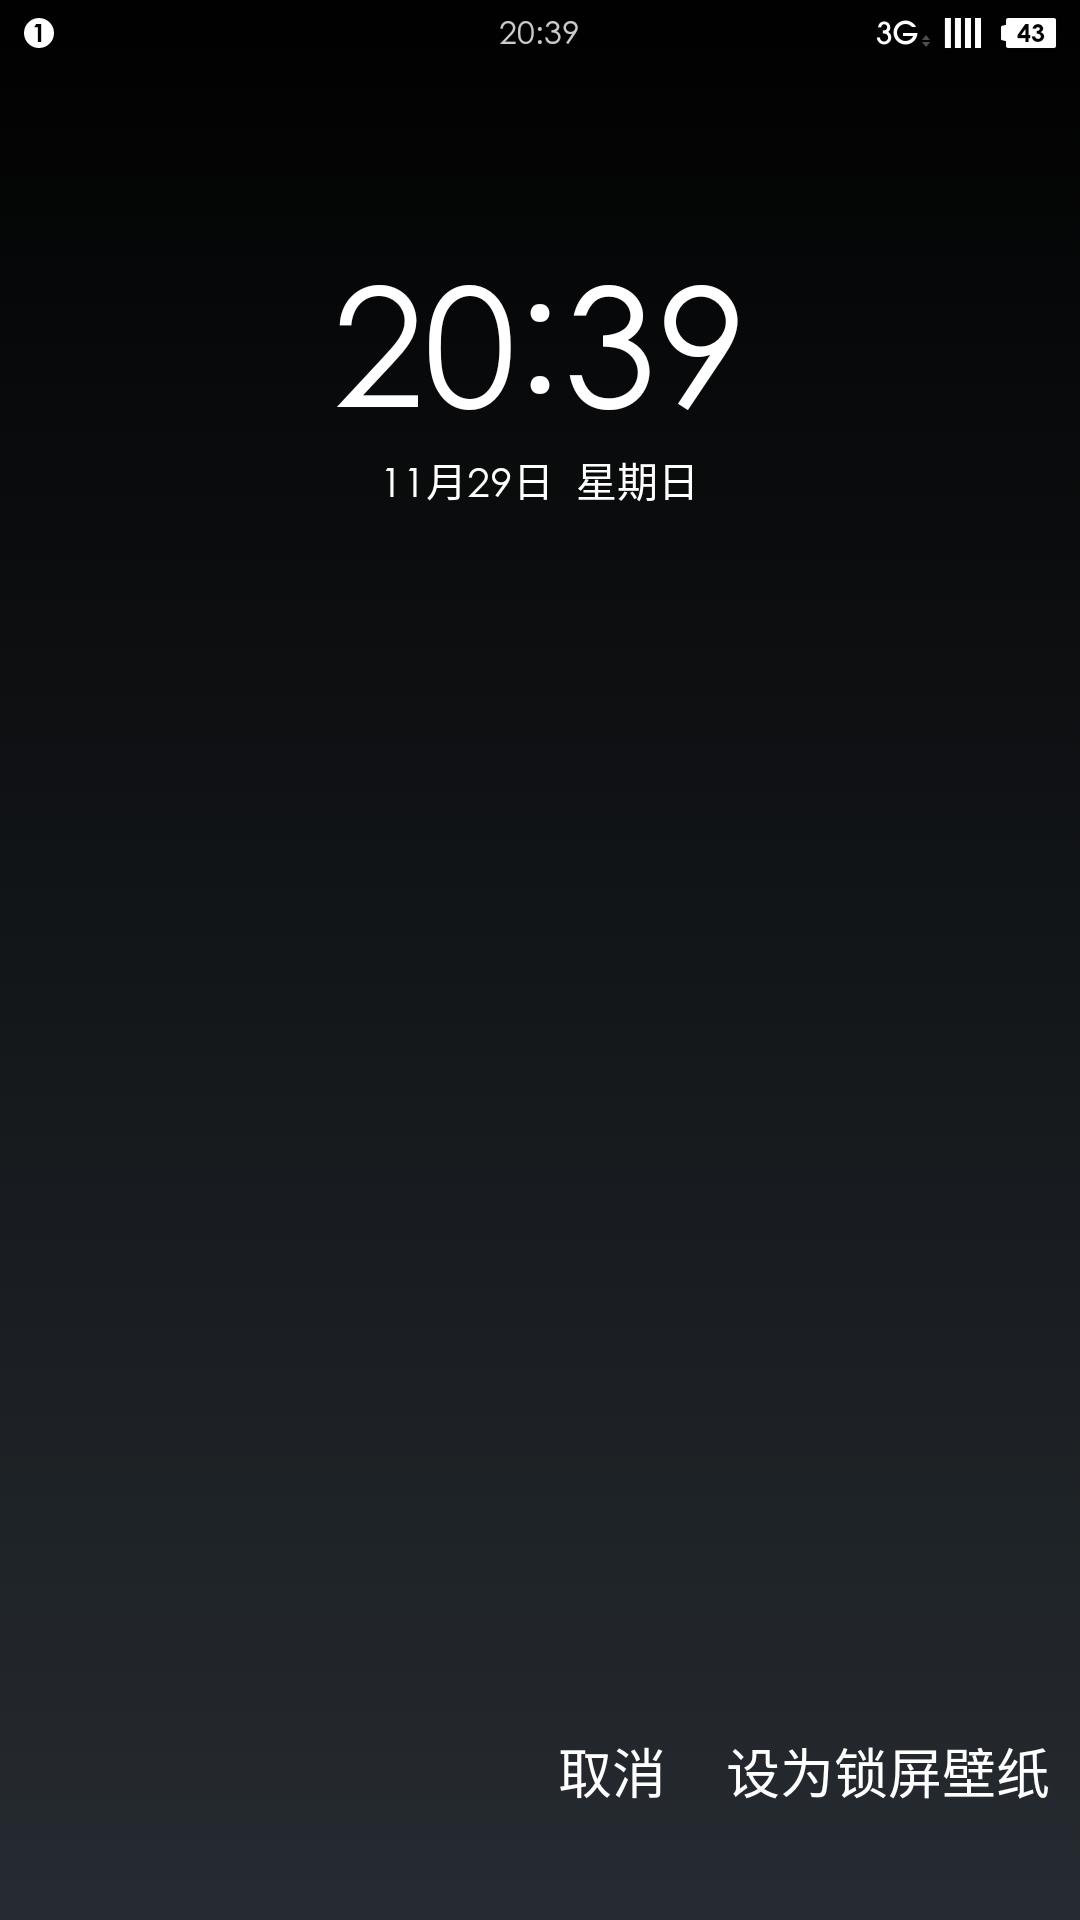 Screenshot_2015-11-29-20-39-18.png